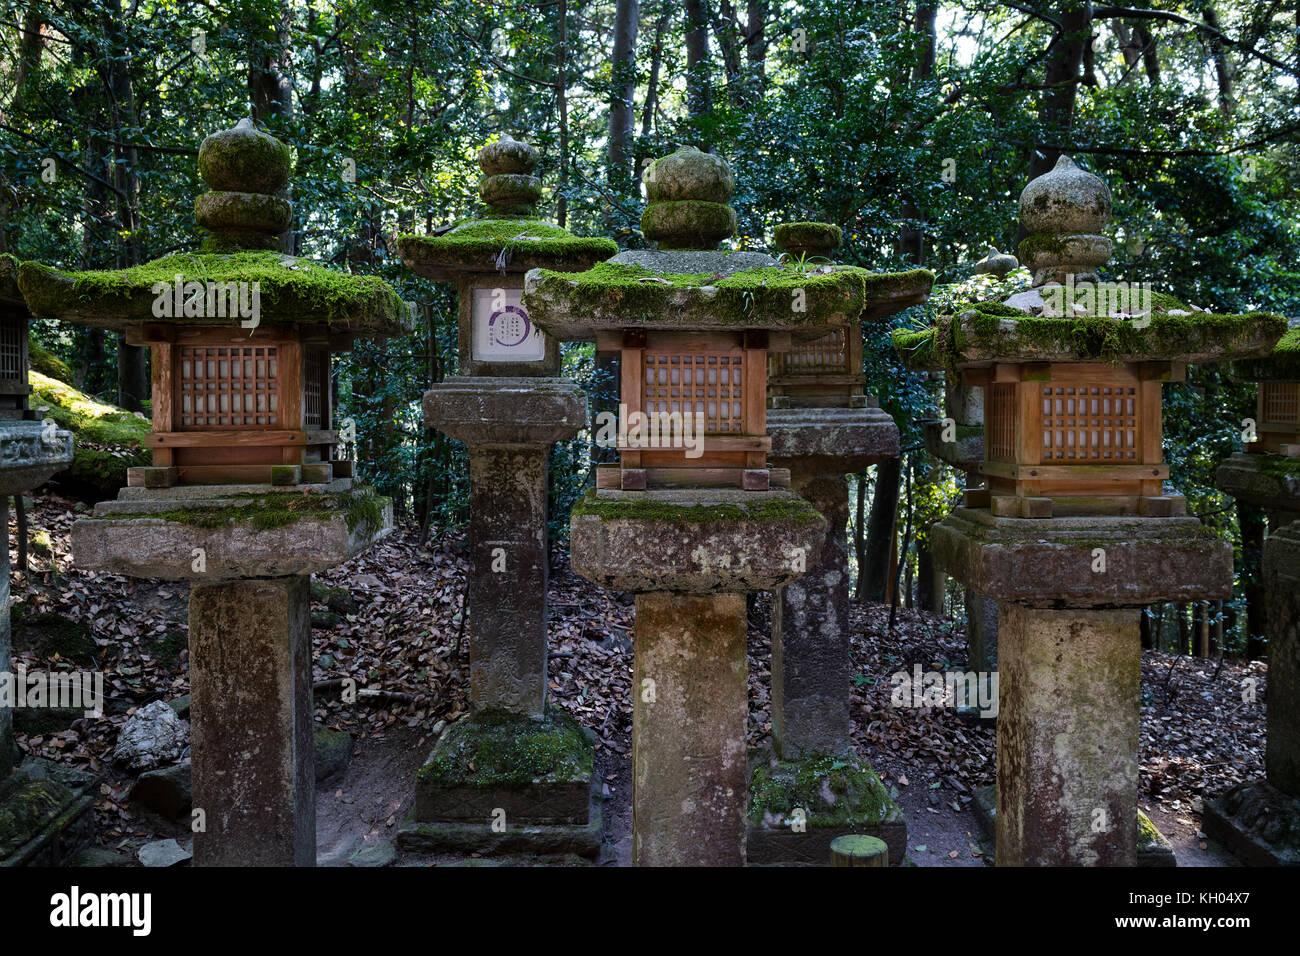 Nara - Japan, May 29, 2017:  Stone lanterns covered with moss along the path that lead up to the Kasuga Taisha shrine - Stock Image